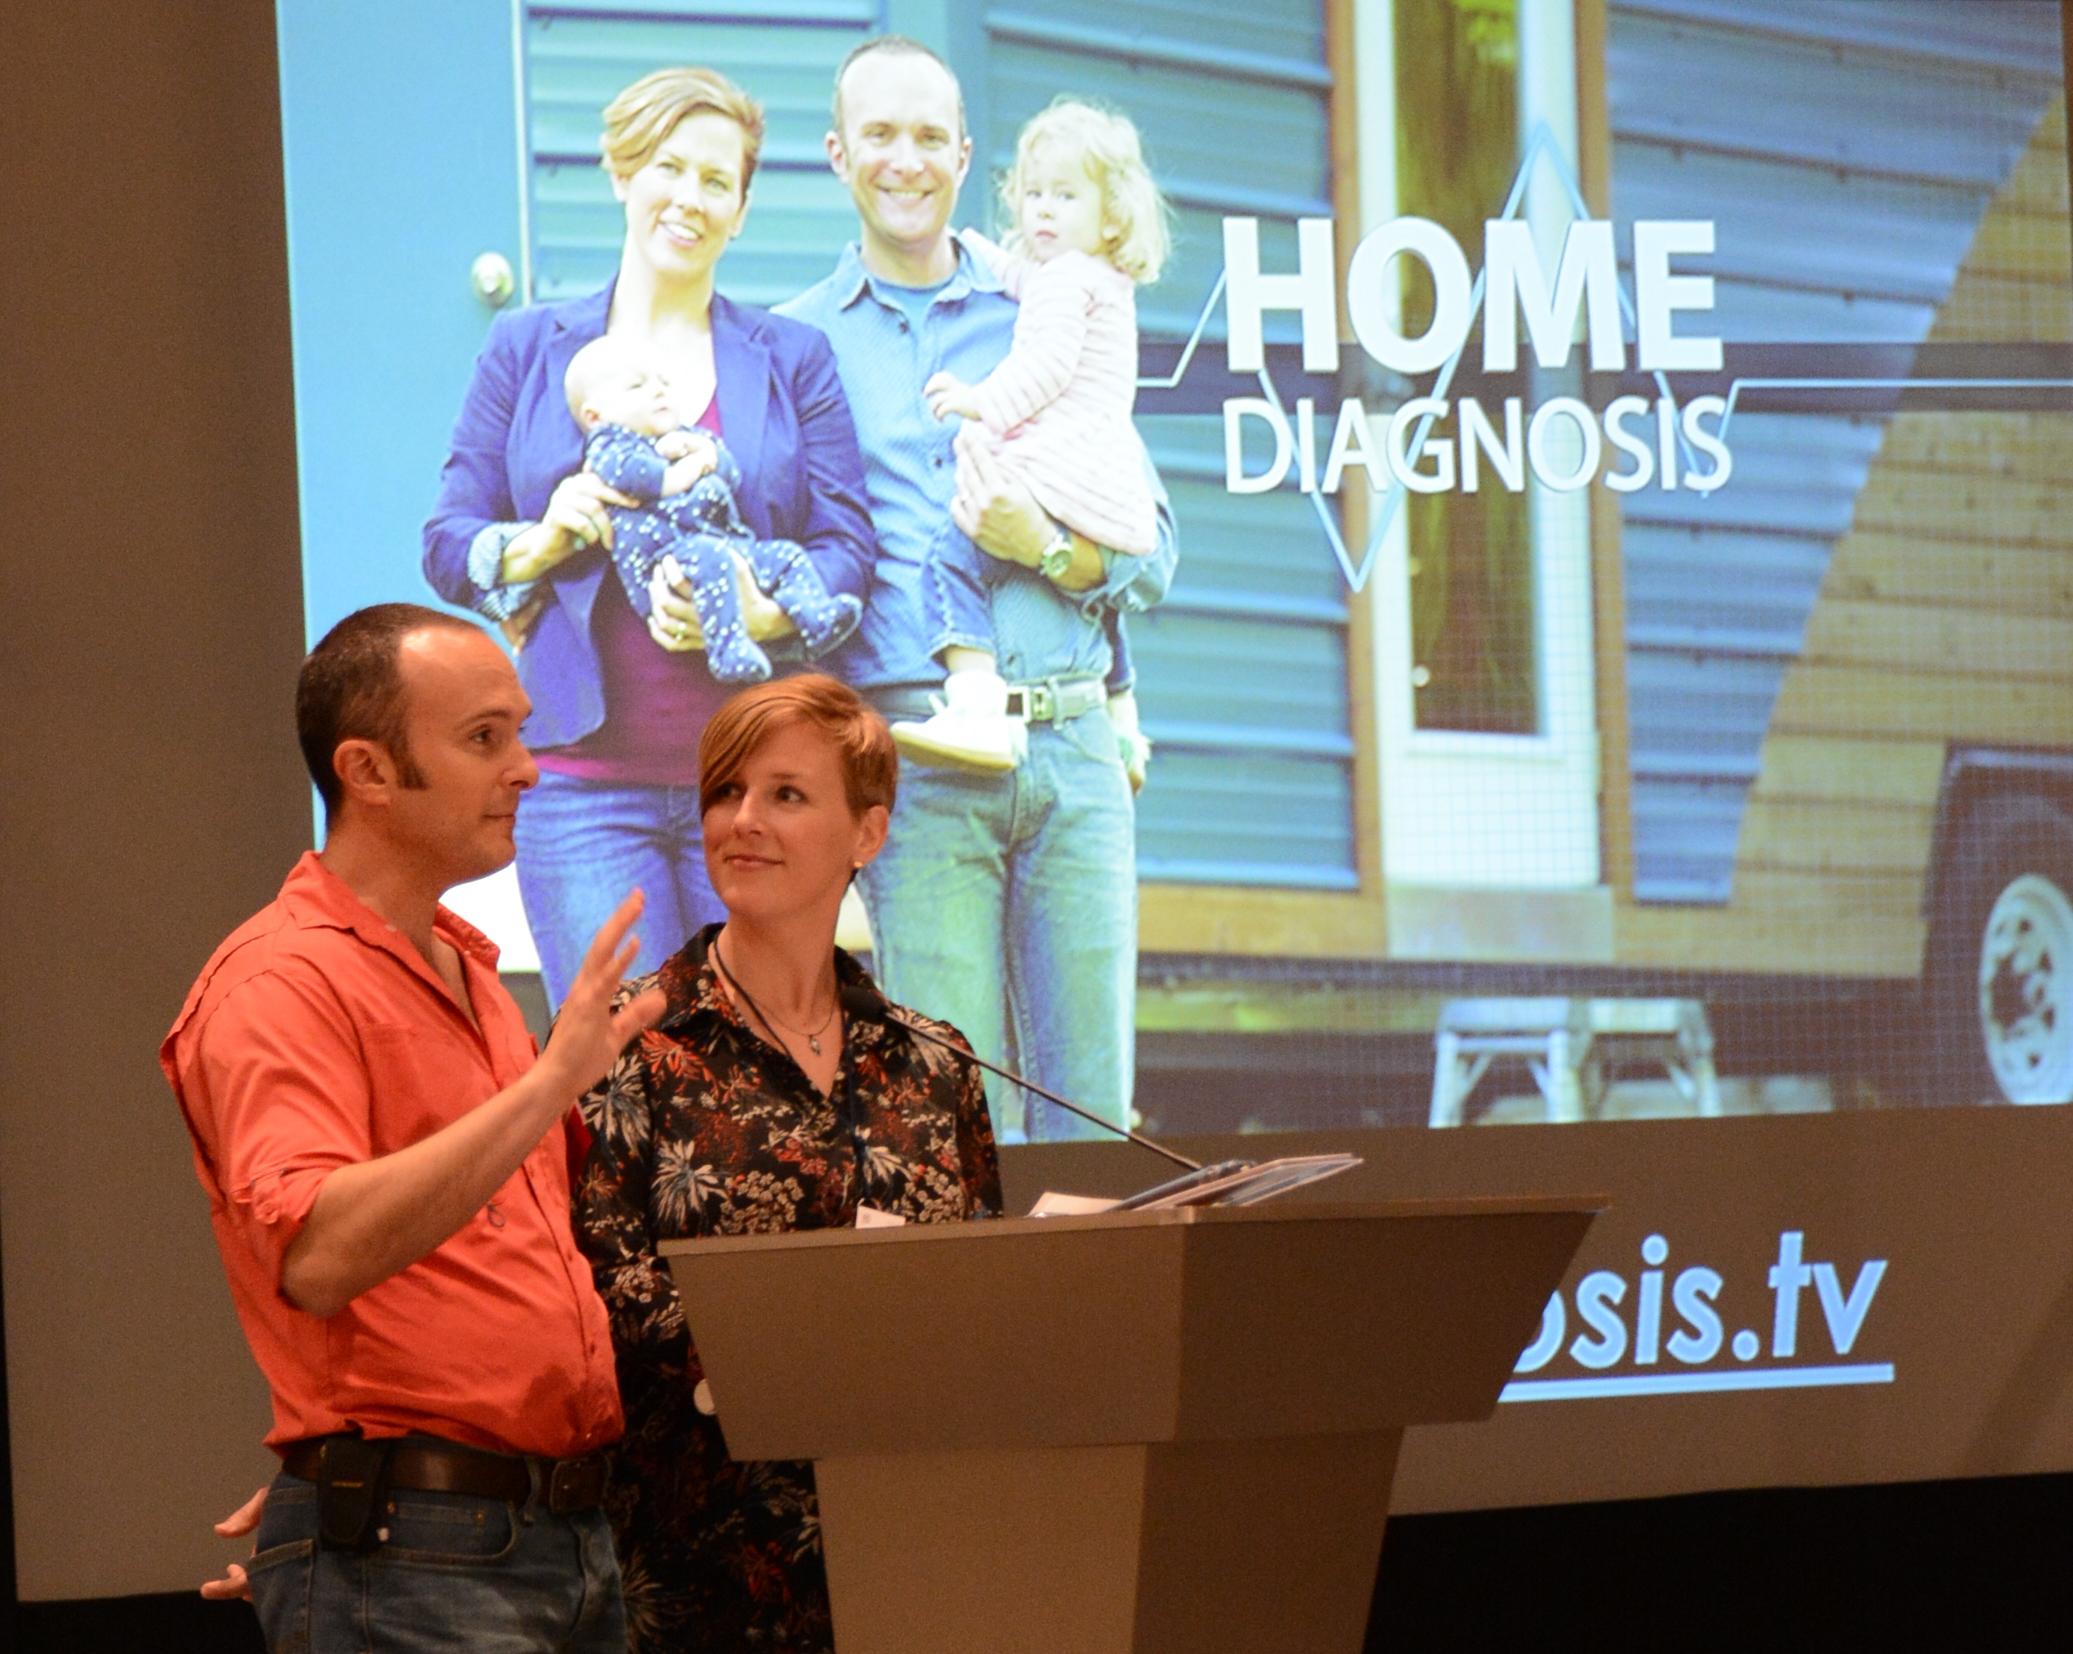 HomeDiagnosisTV-Presentation.JPG